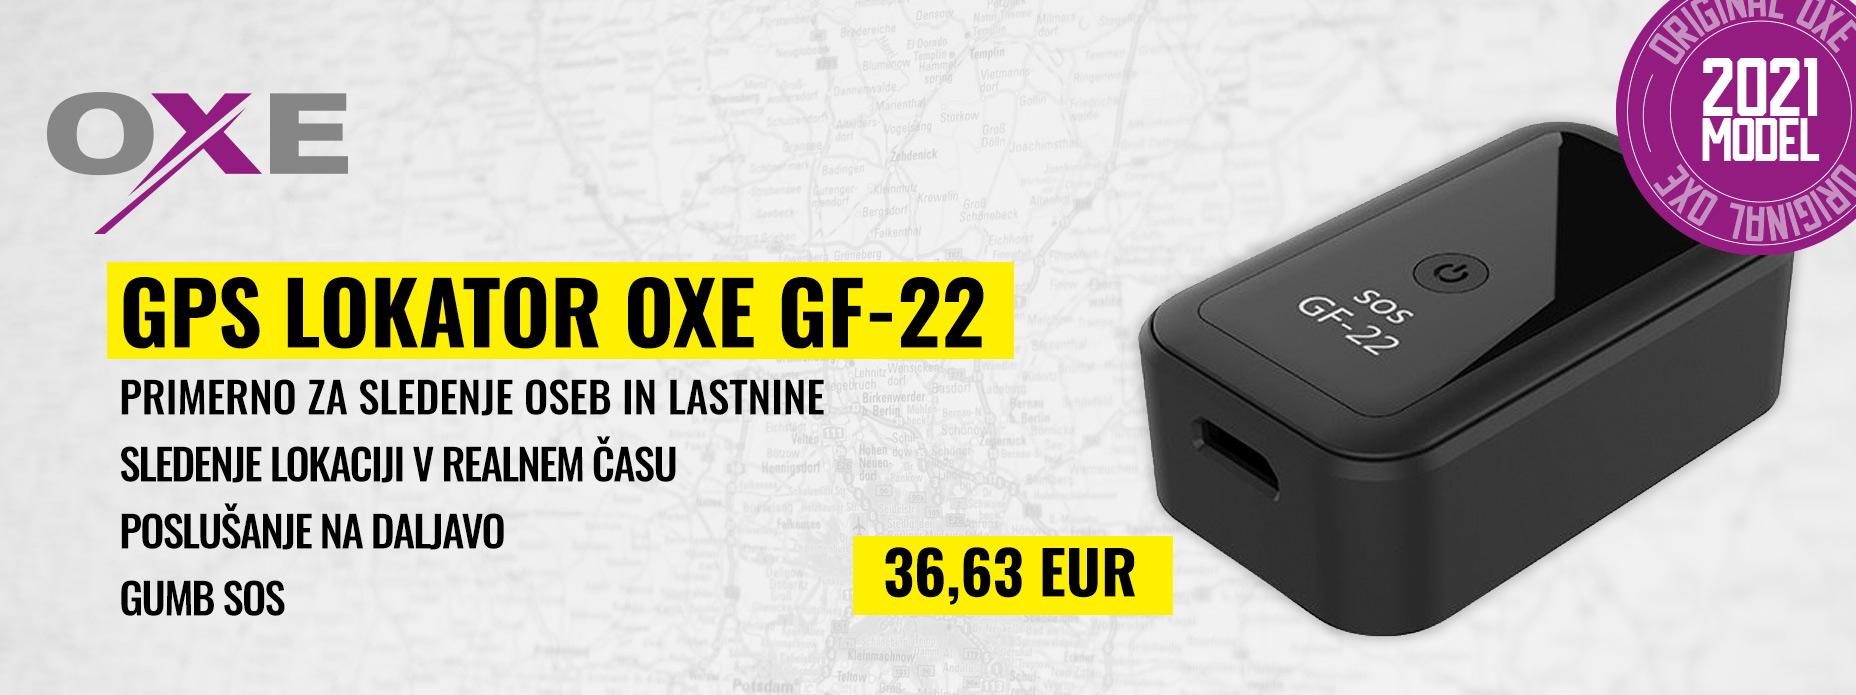 OXE GF-22 - GPS lokator